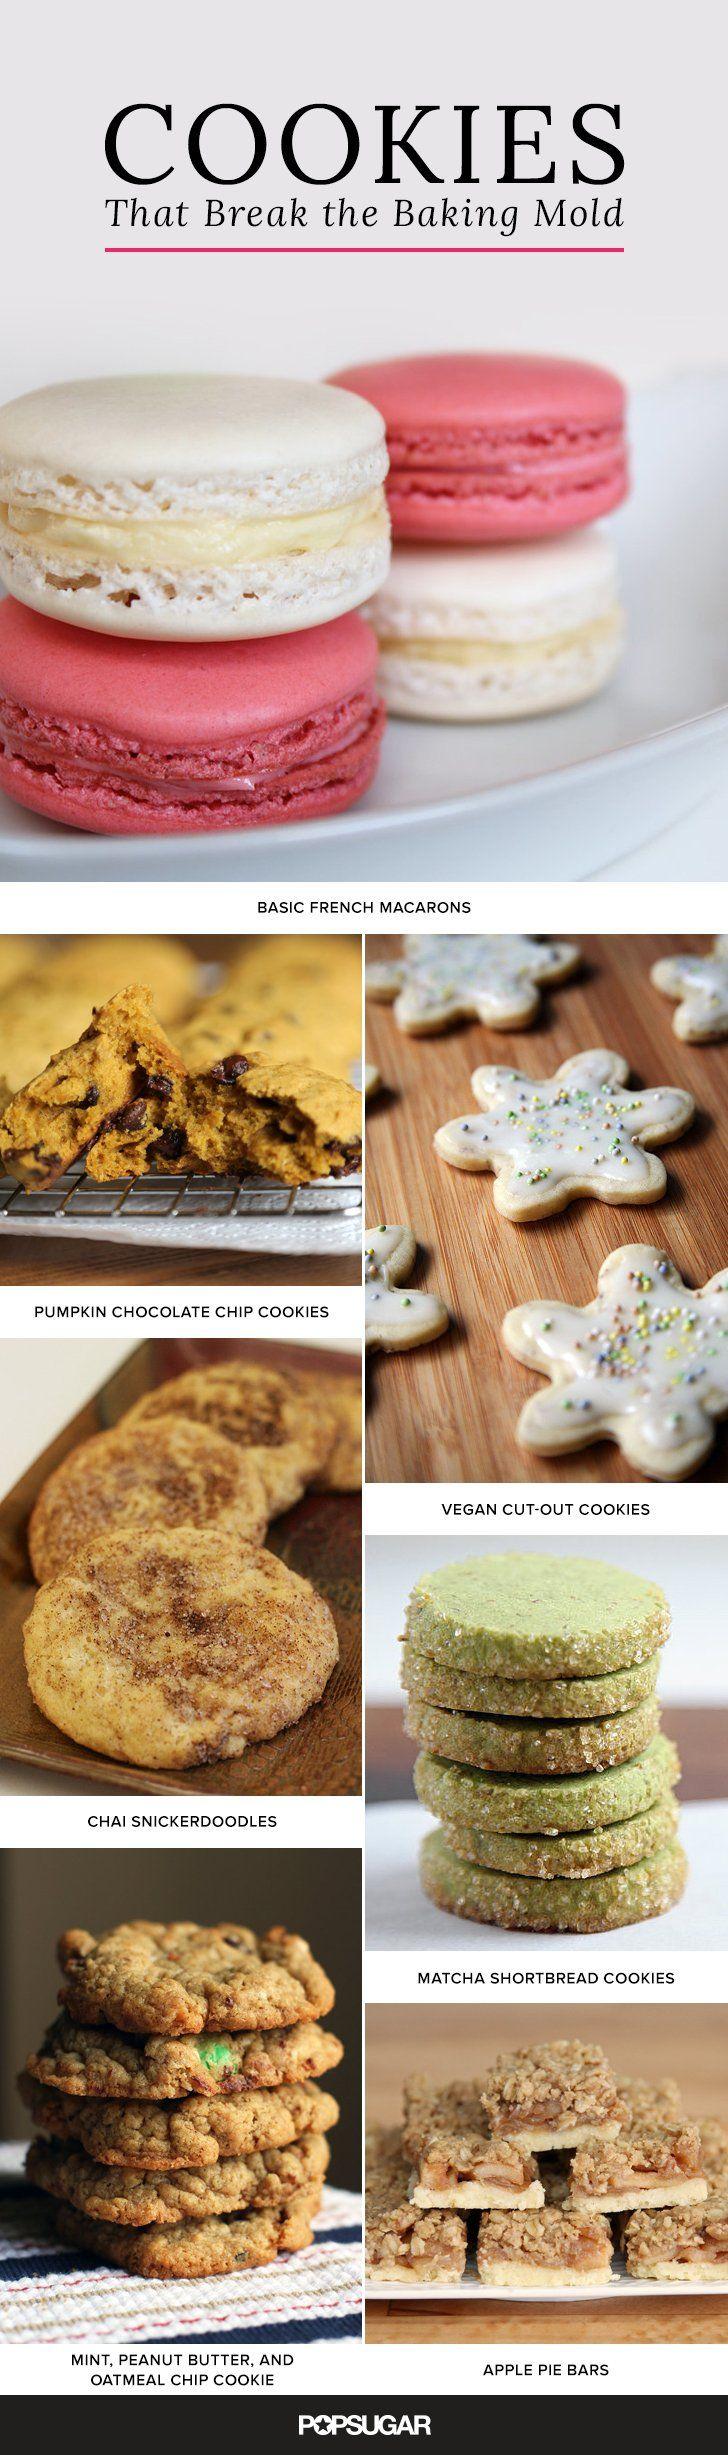 Recipes, Menus, Food & Wine | 15 Cookies That Break the Baking Mold | POPSUGAR Food Photo 16